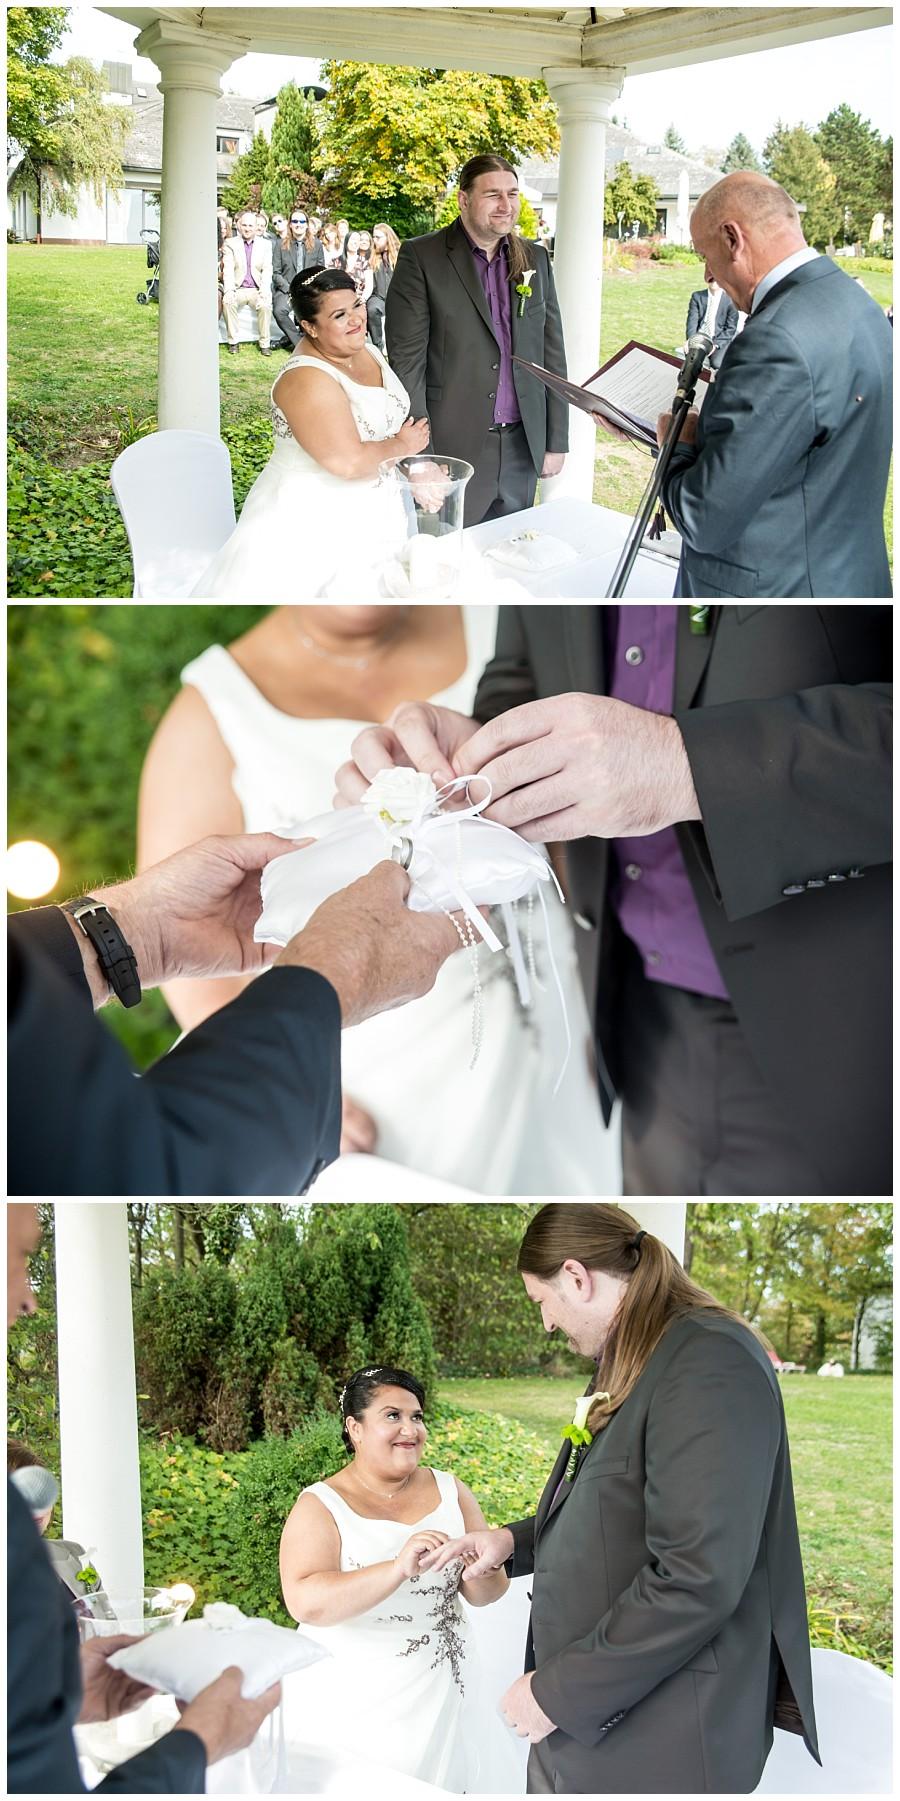 Hochzeit_Reitershof_Wirsberg_Claudia-Pelny-Fotografie_16